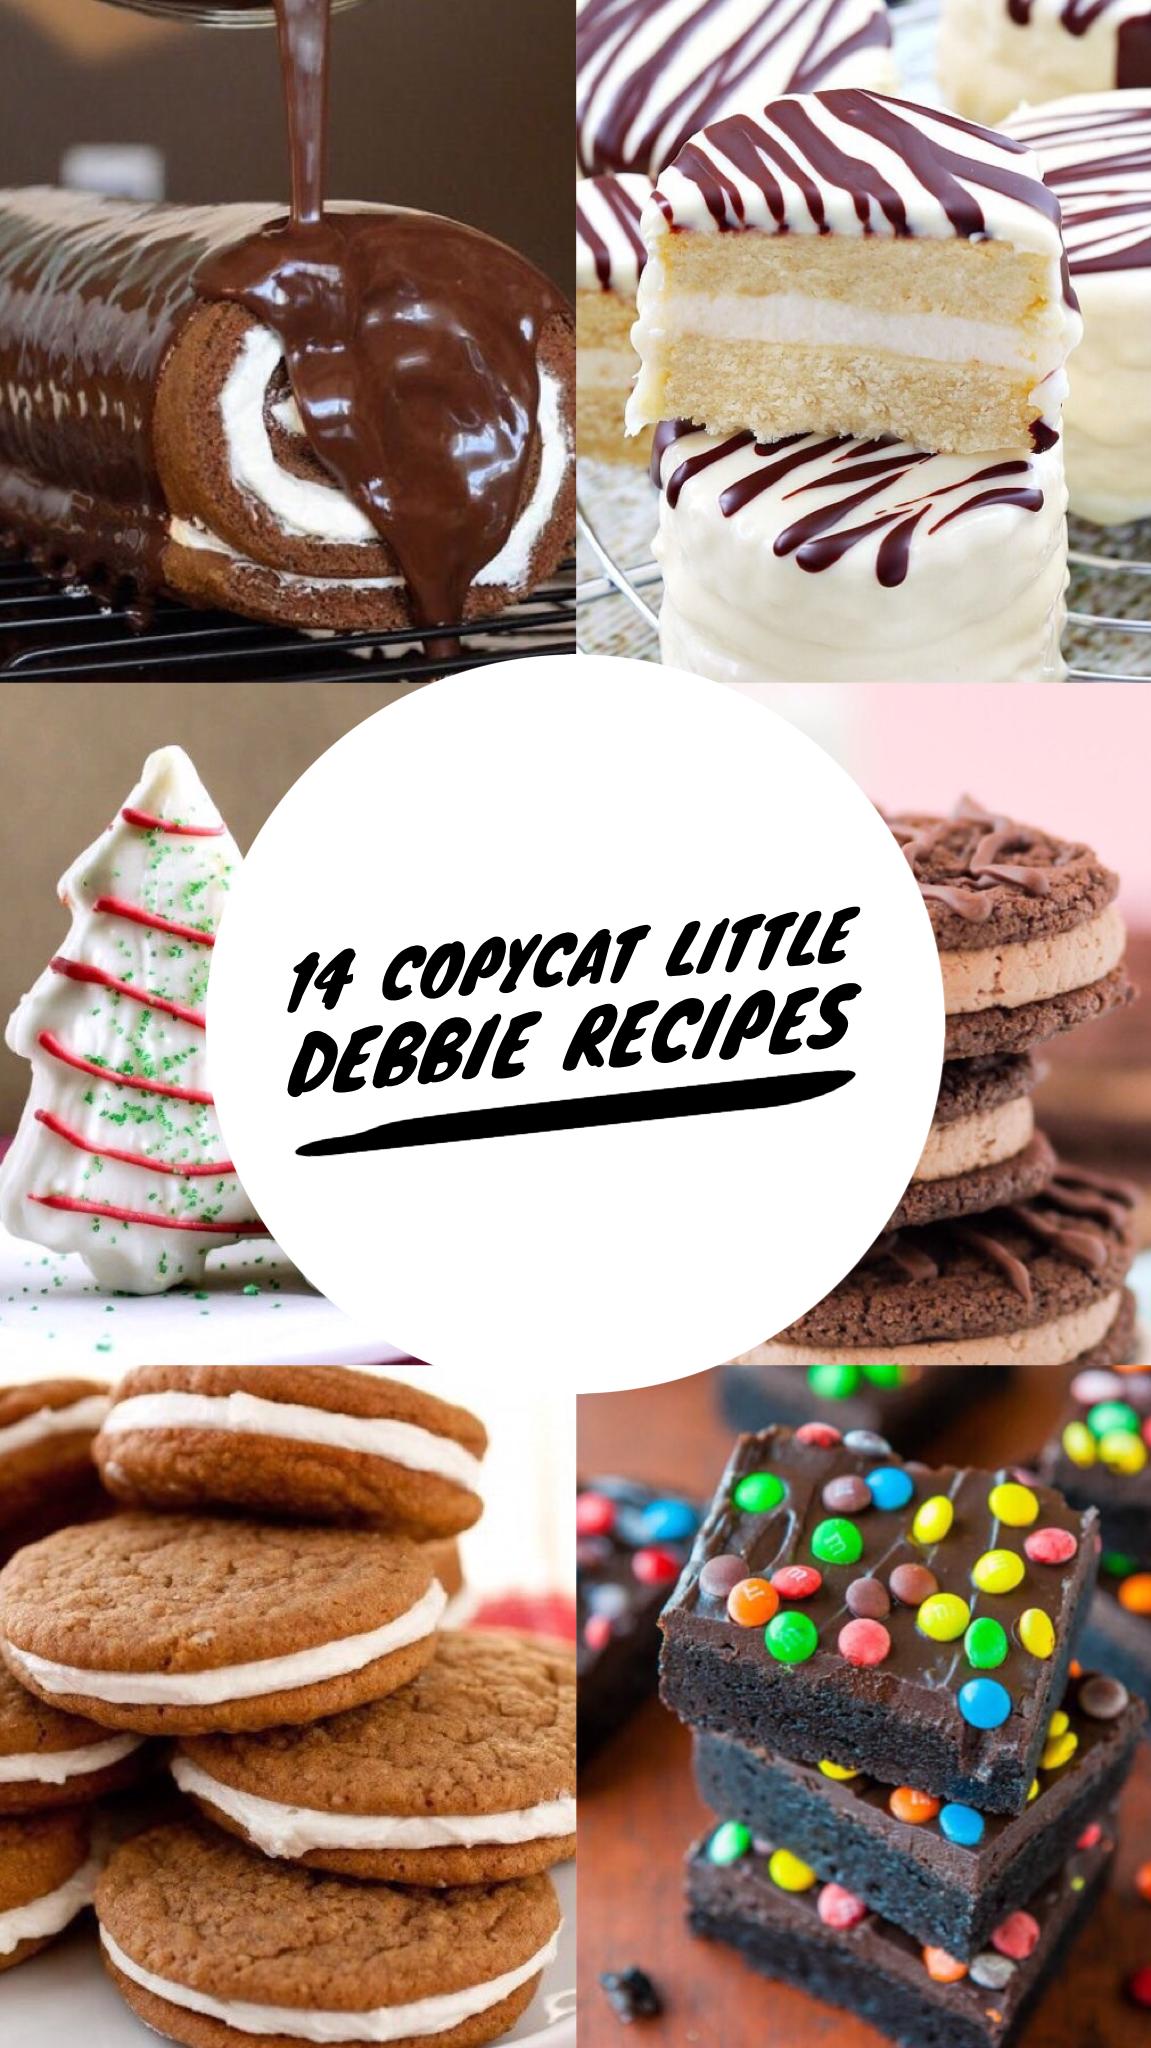 Little Debbie Recipes Ideas : little, debbie, recipes, ideas, Copycat, Little, Debbie, Recipes, Captain, Decor, #bestrecipes, #burgerre…, Copykat, Recipes,, Snack, Cakes,, Dessert